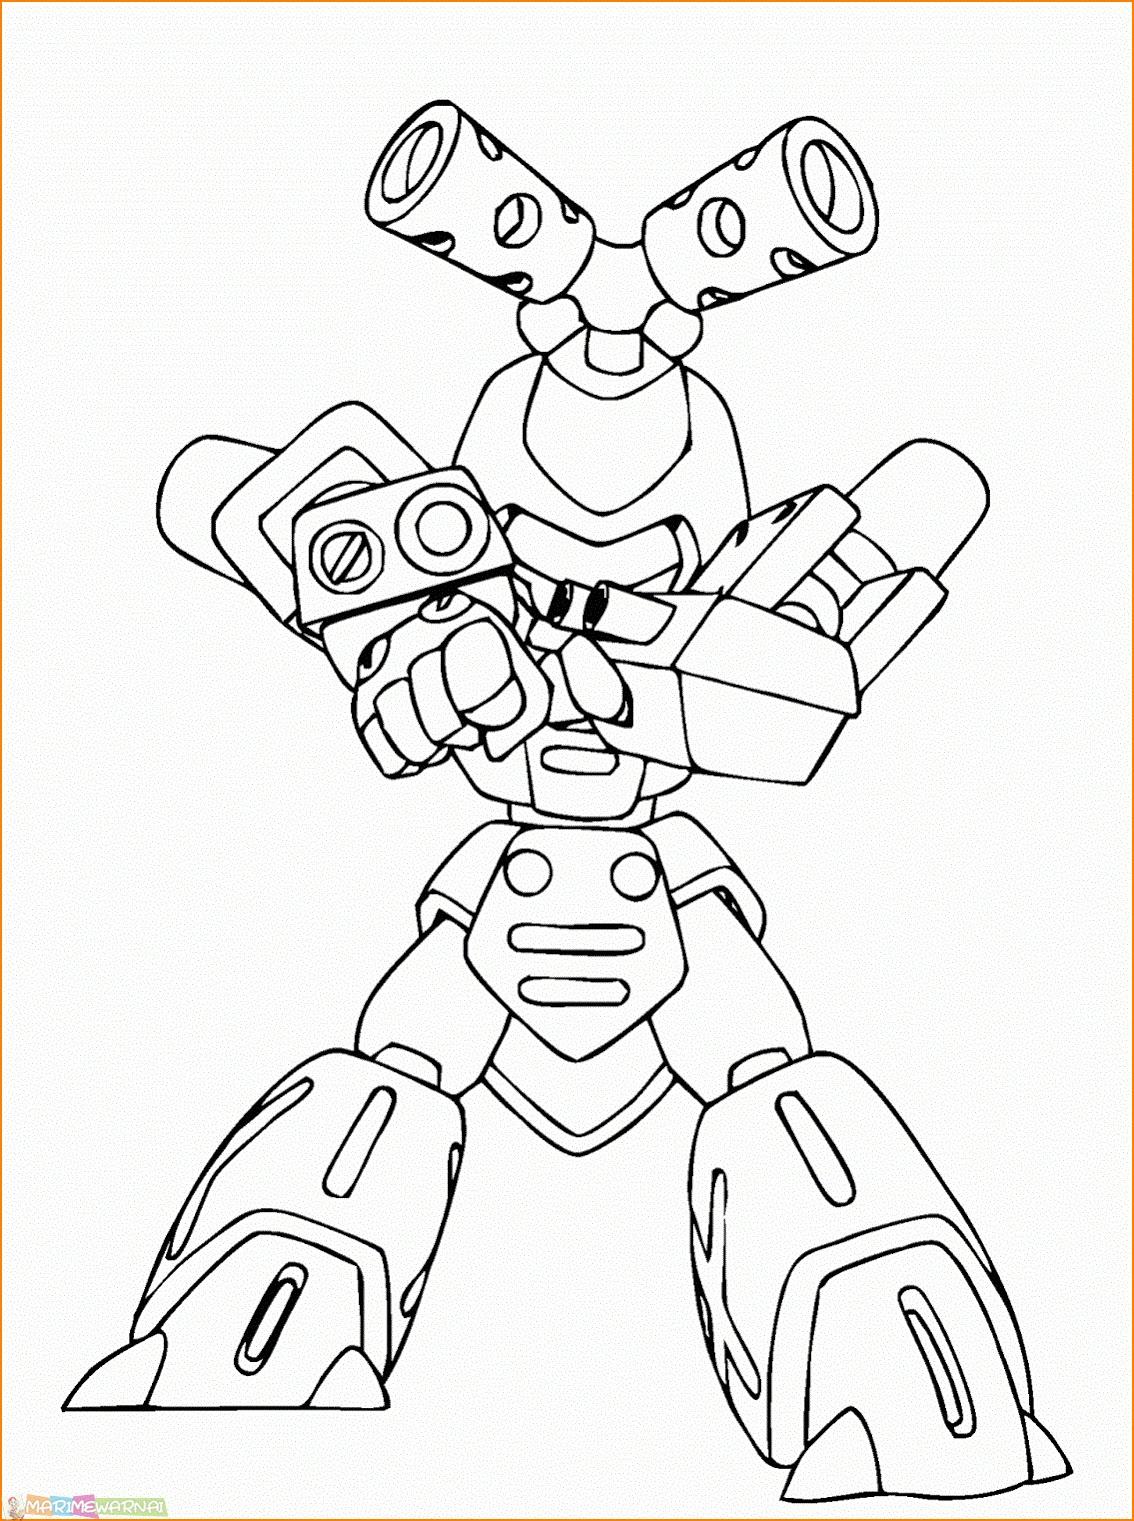 Gambar Mewarnai Doraemon Auto Electrical Wiring Diagram